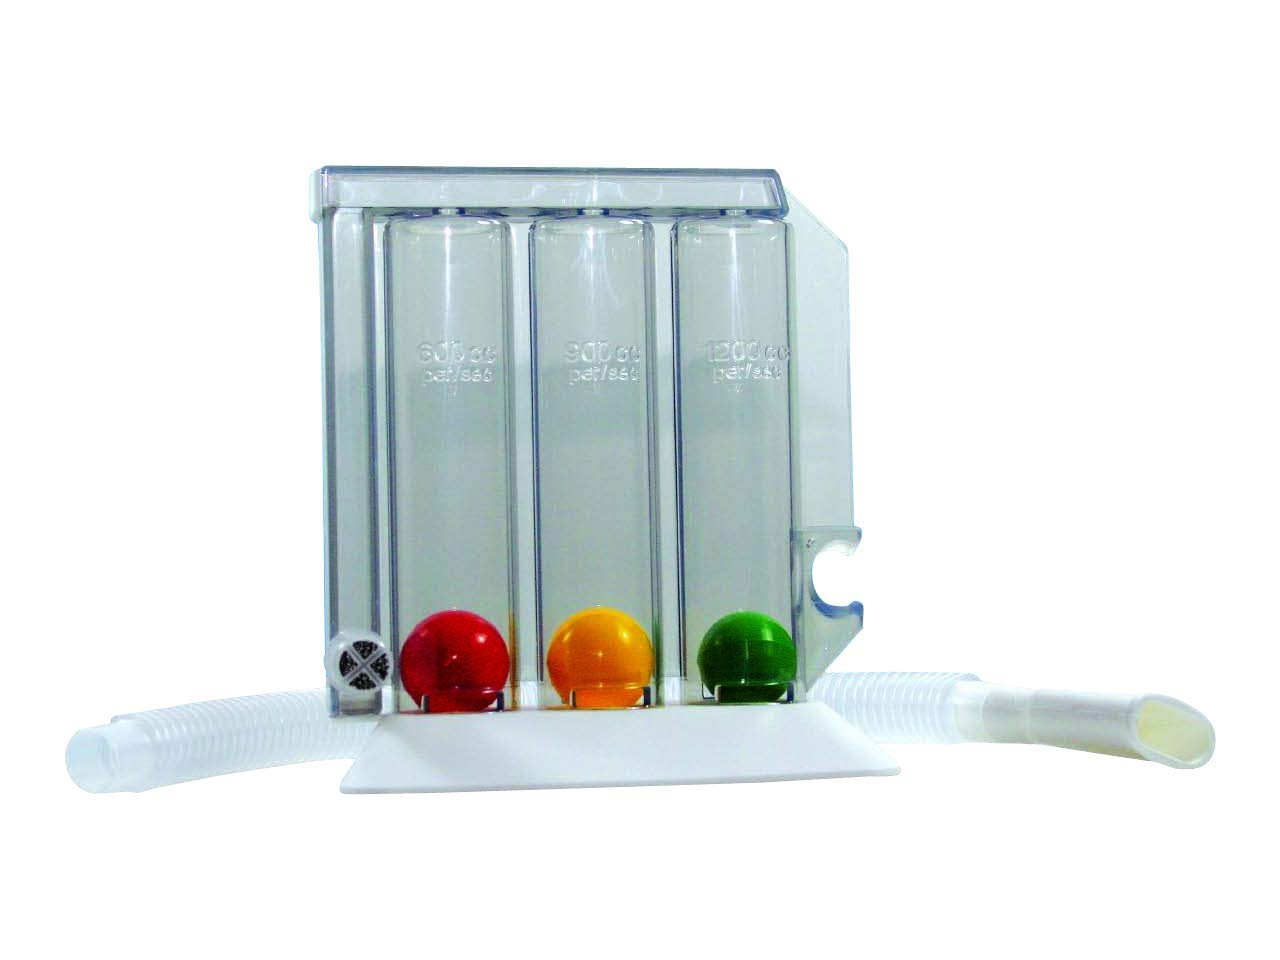 GIMA ref 33442 Entrenador respiratorio Respirogram, dispositivo para ejercer la respiración por inhalación con base, 3 bolas diferentes, una parte central transparente tripartida, tubo y boquilla